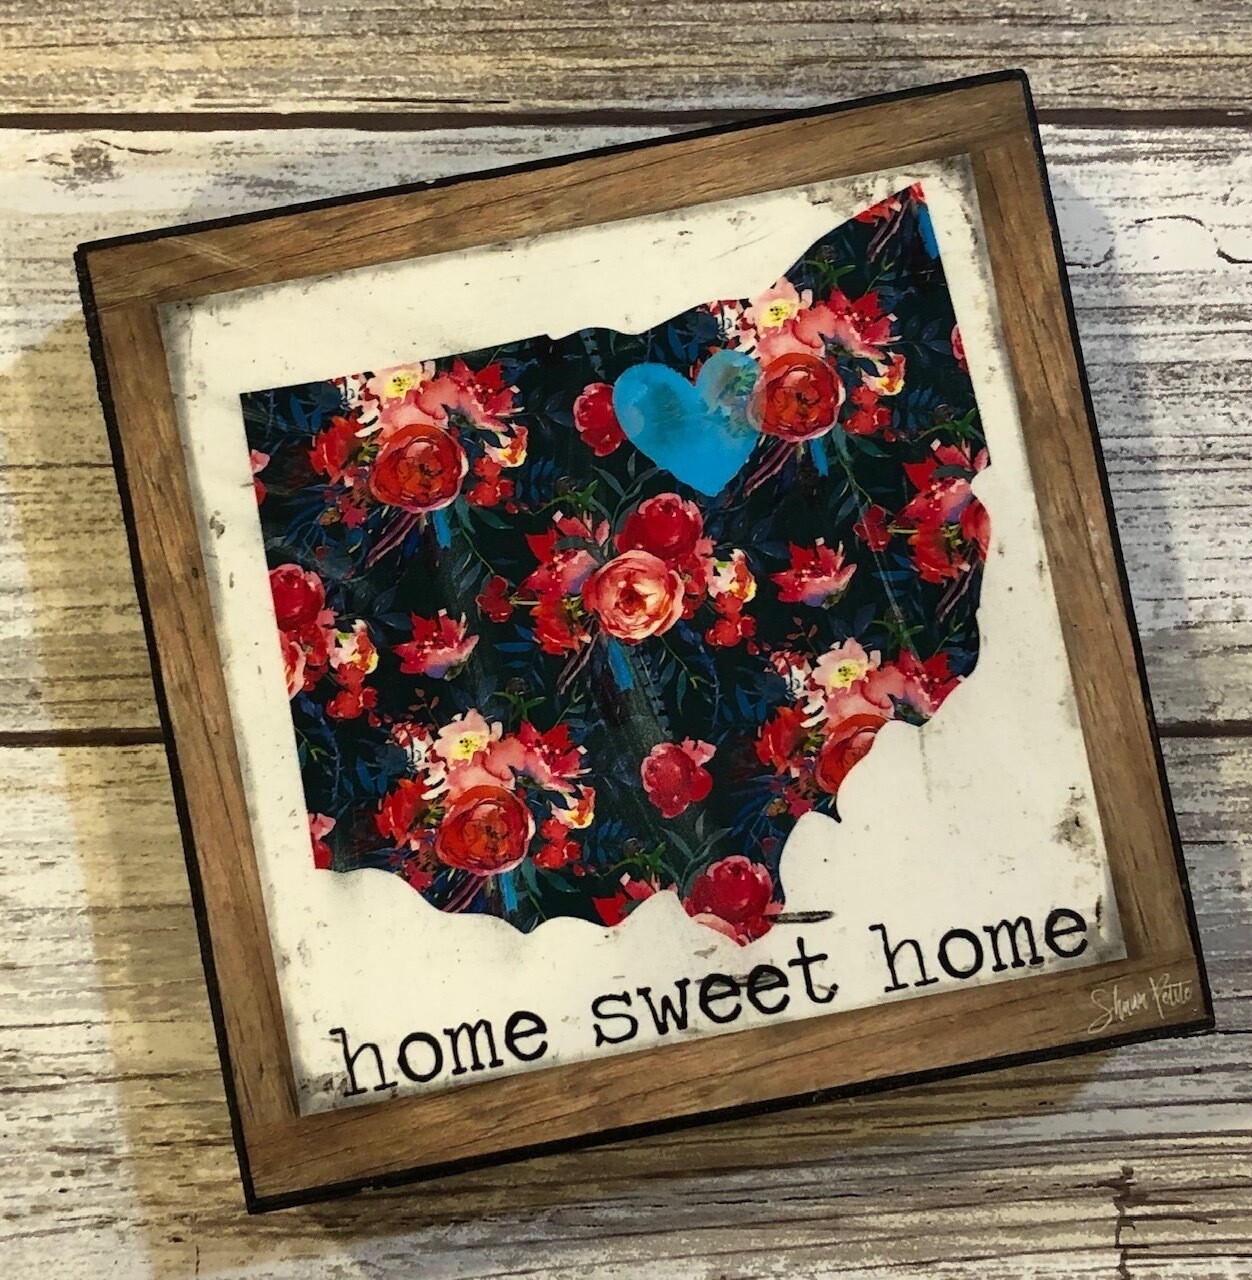 """Home Sweet Home"" Ohio flower 4x4 Clearance"